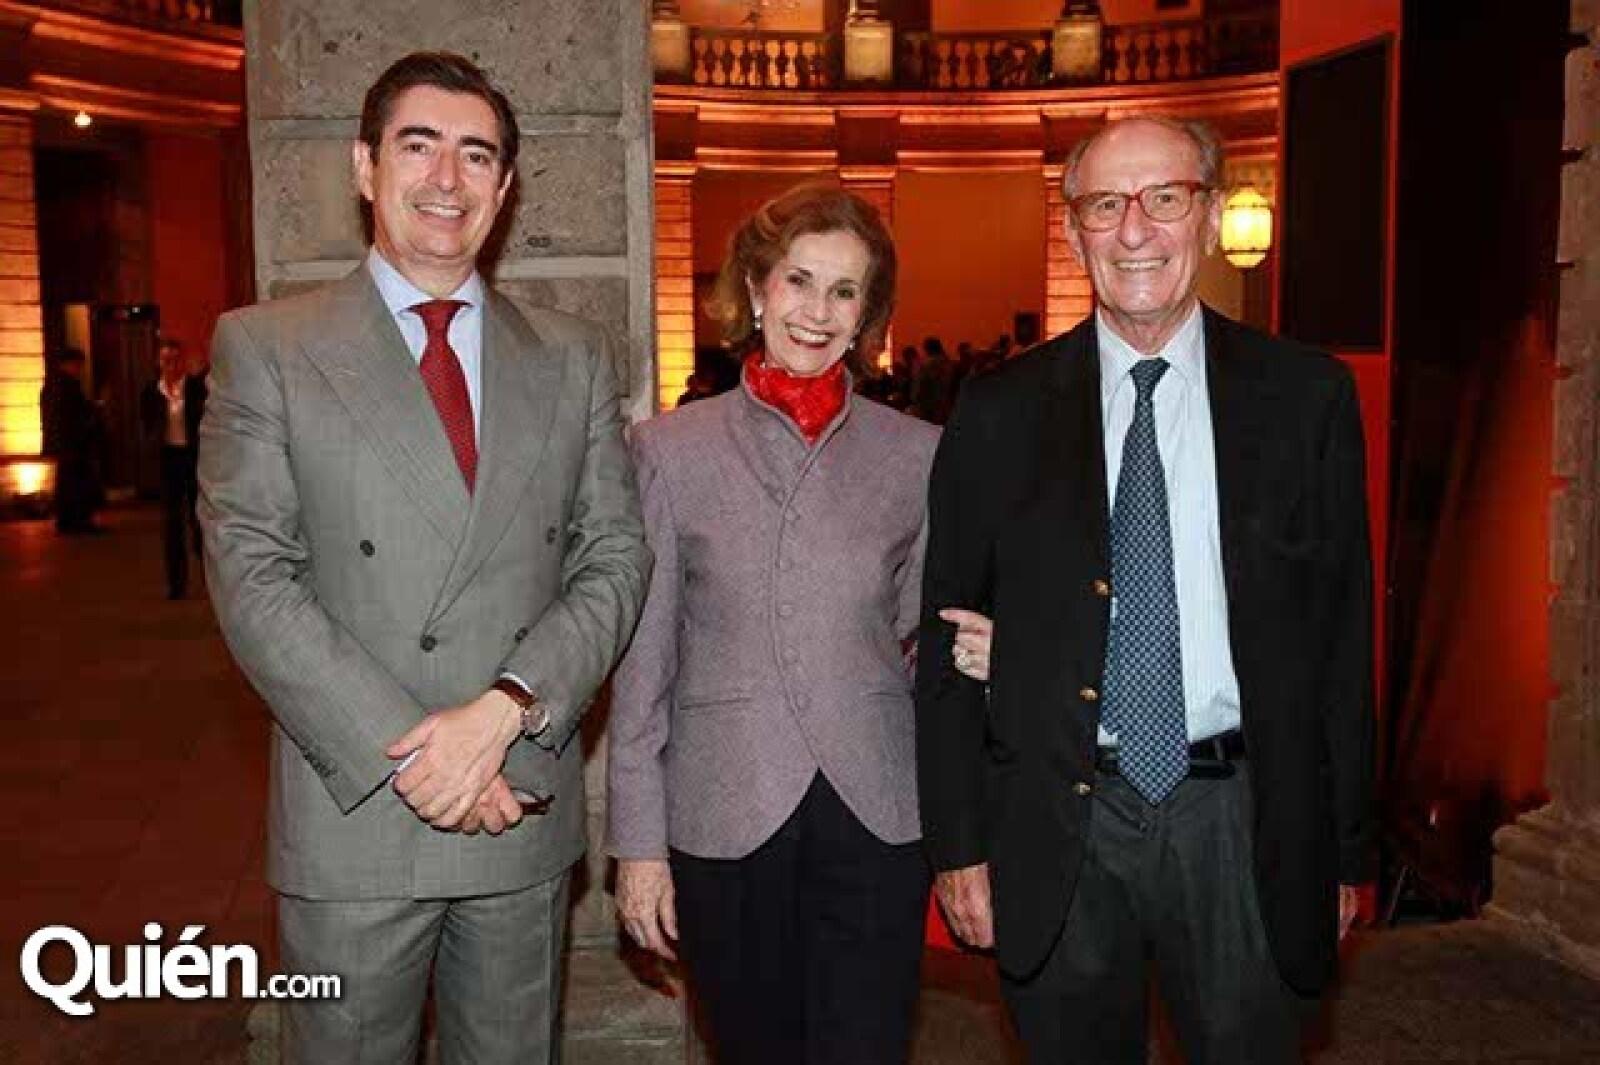 Fernando Tovar y de Teresa,Natalia y Marc Lebreton